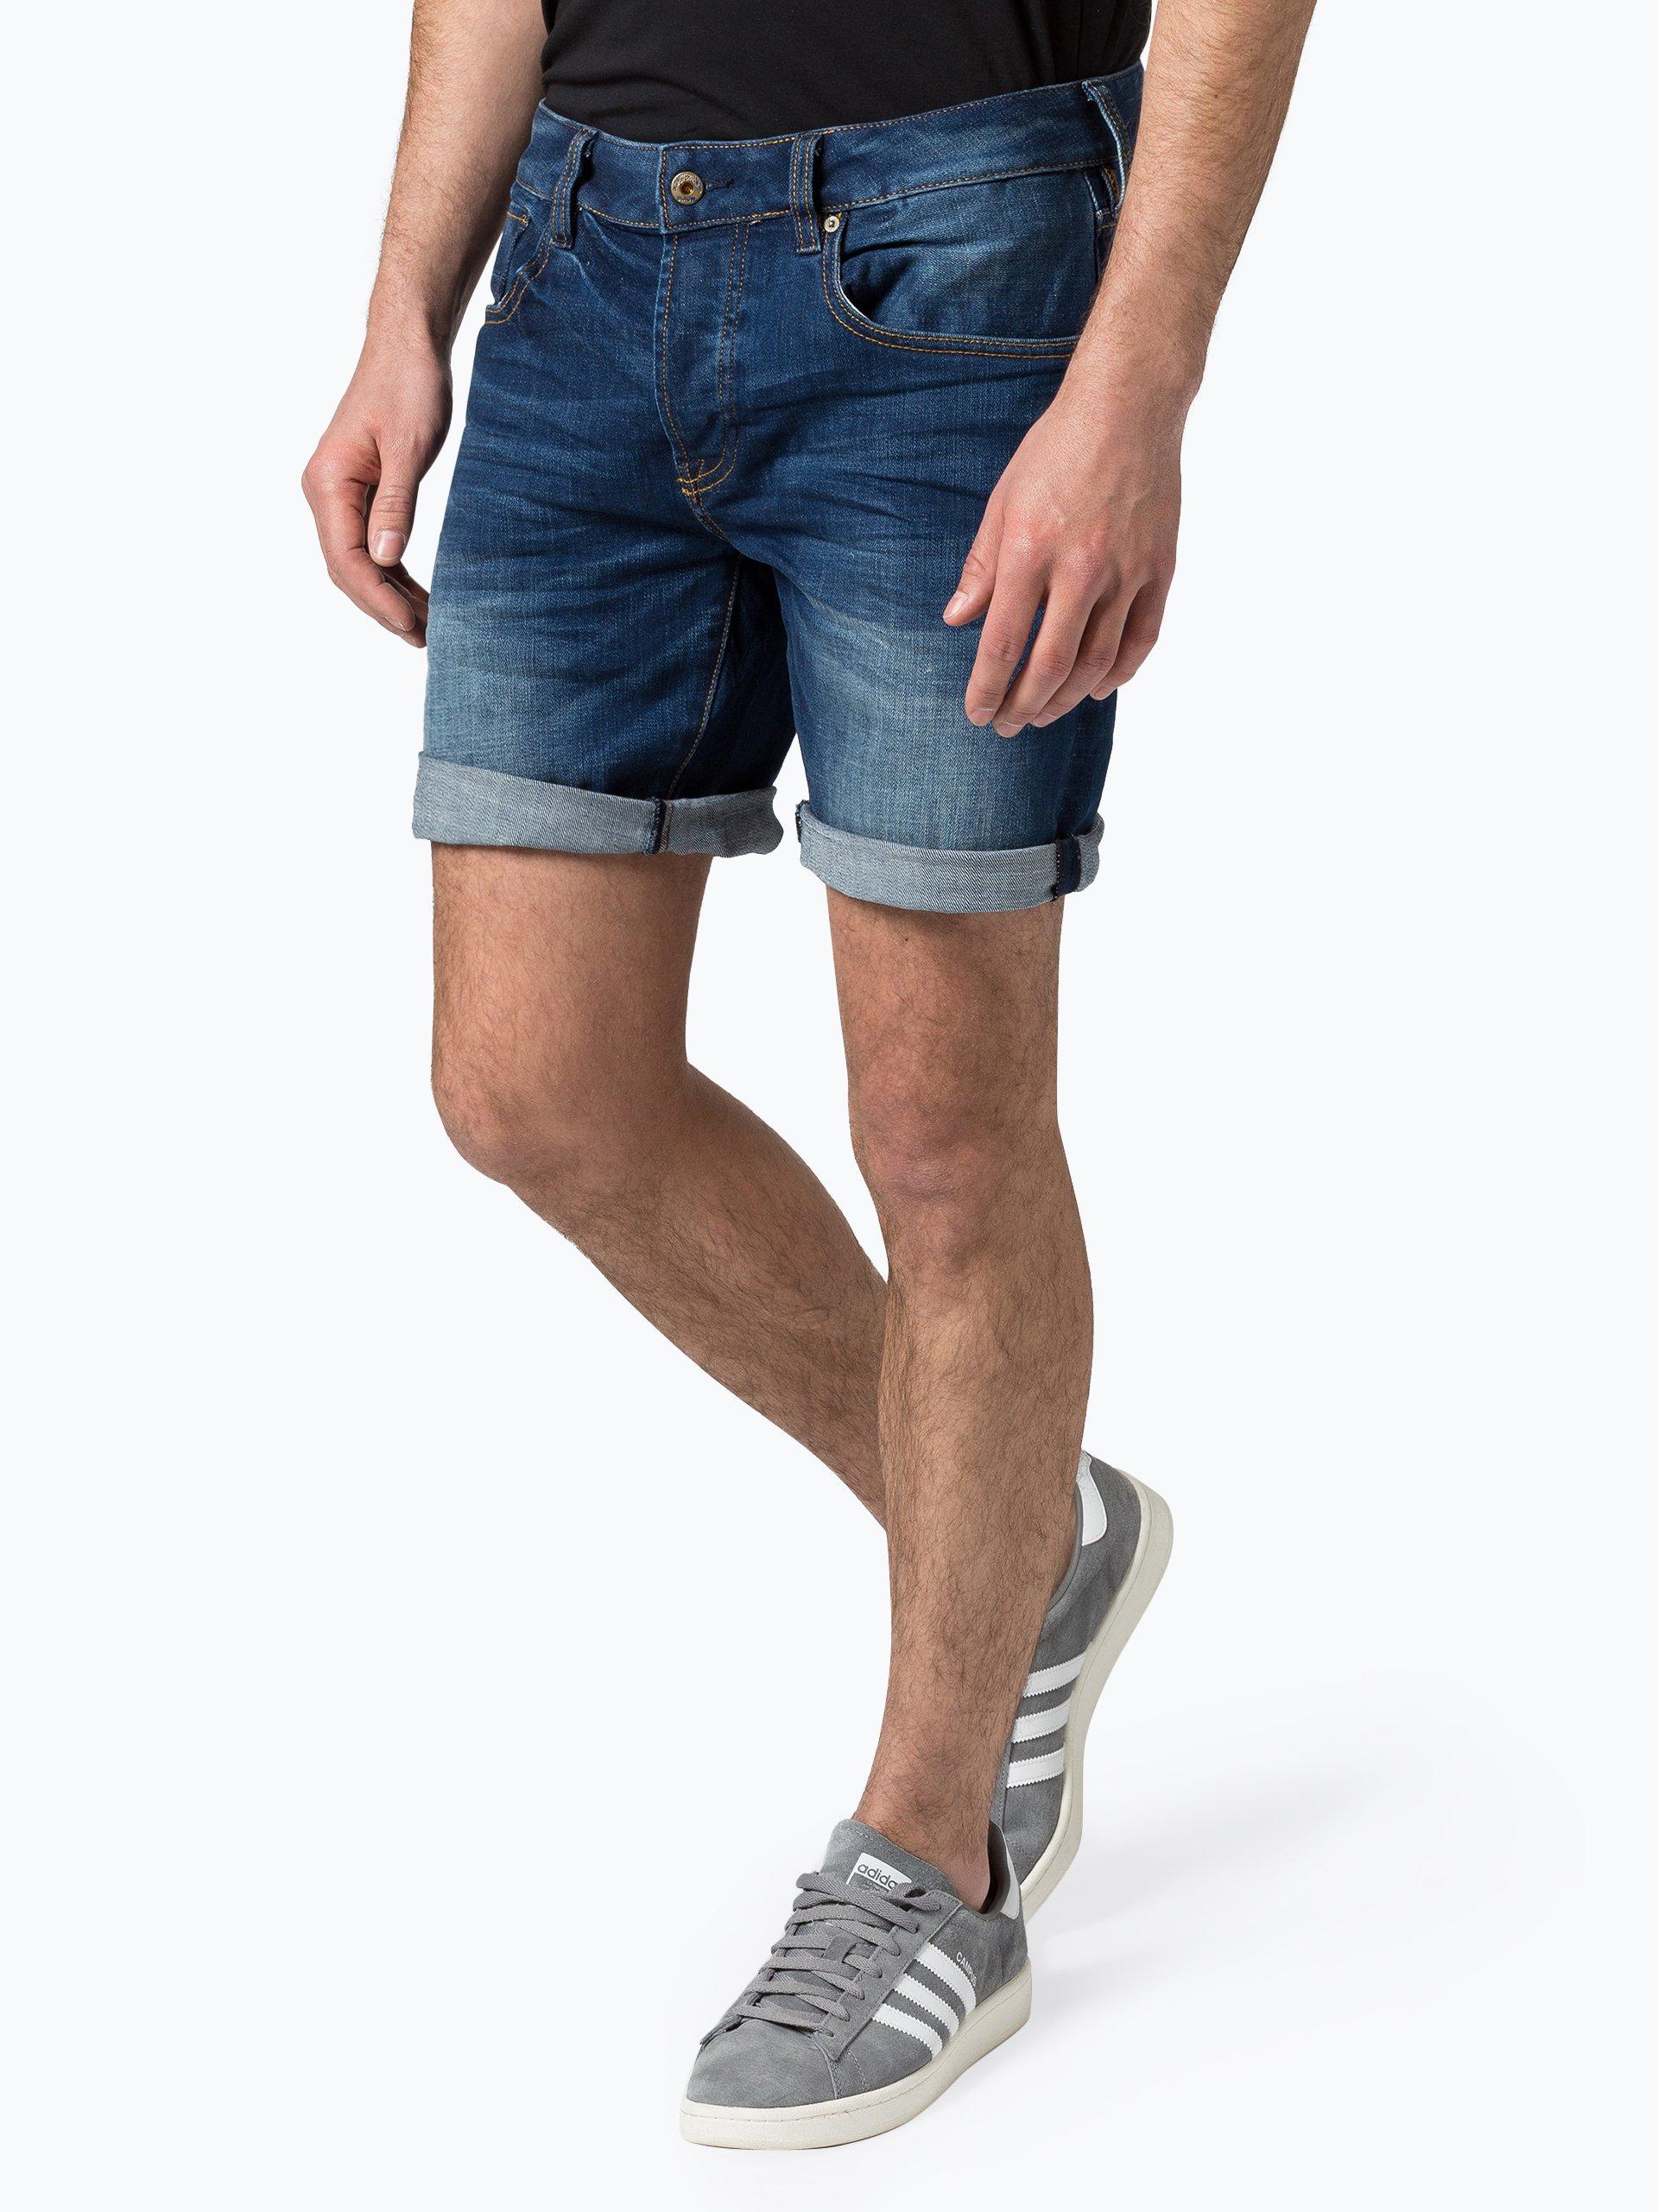 scotch soda herren jeans shorts denim uni online kaufen vangraaf com. Black Bedroom Furniture Sets. Home Design Ideas